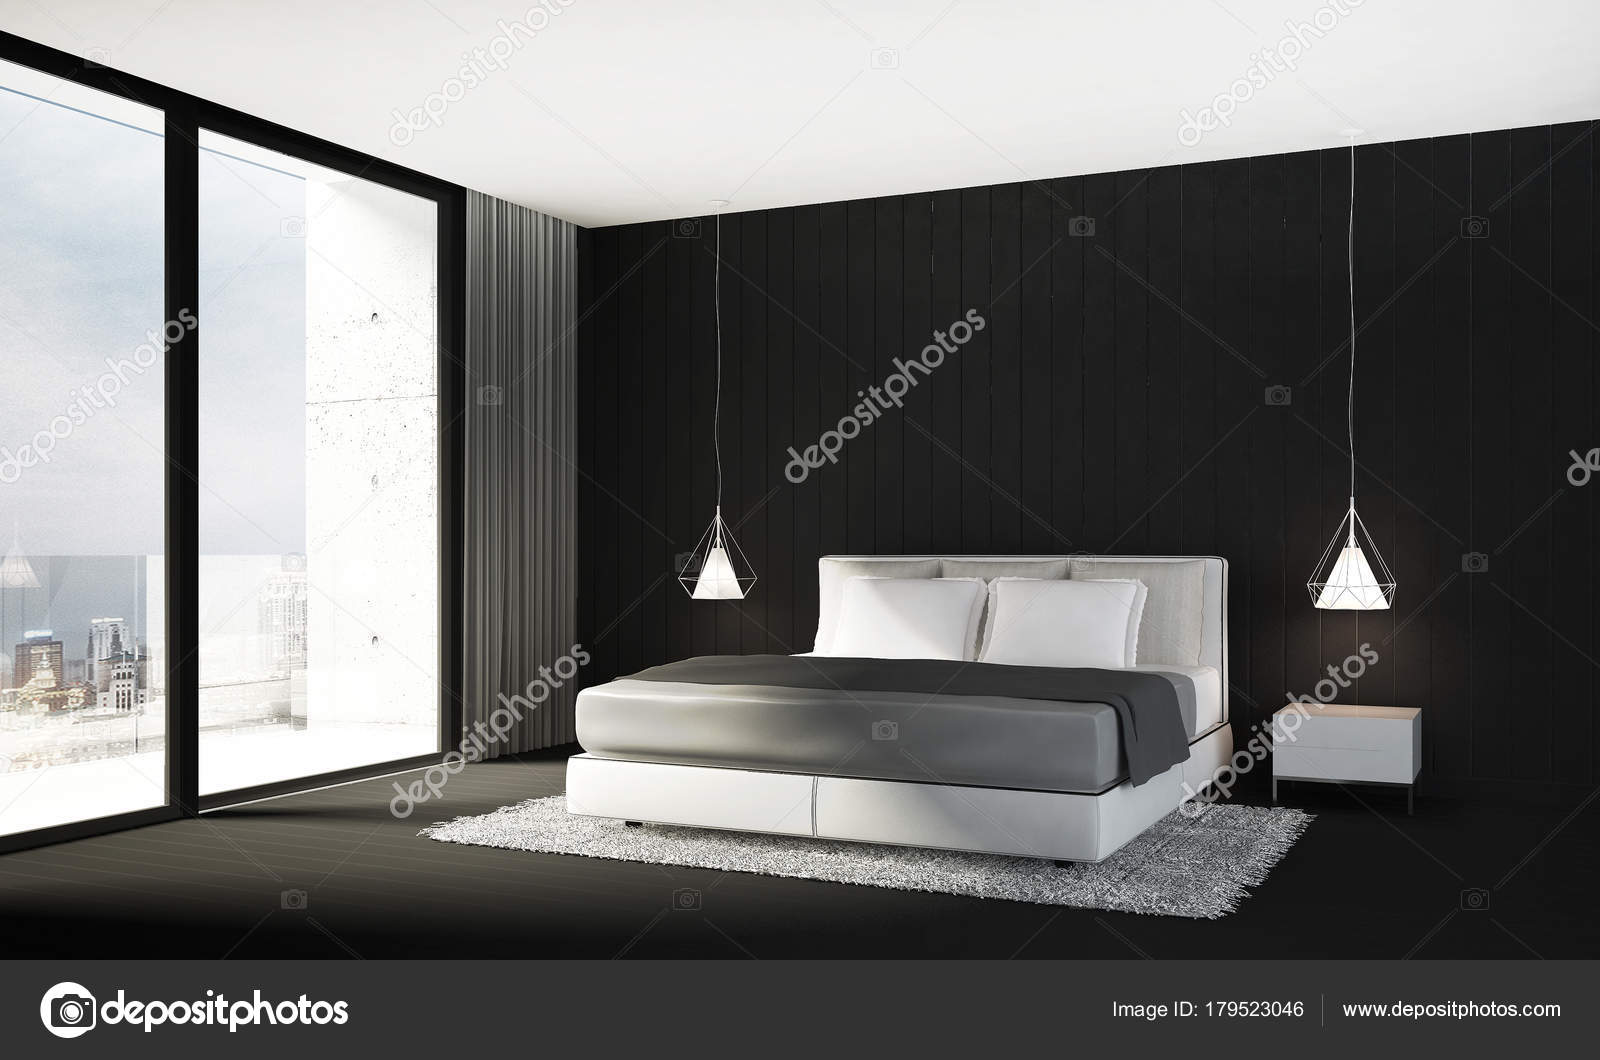 Zwarte Slaapkamer Muur : Rendering interieur van slaapkamer zwarte muur textuur achtergrond